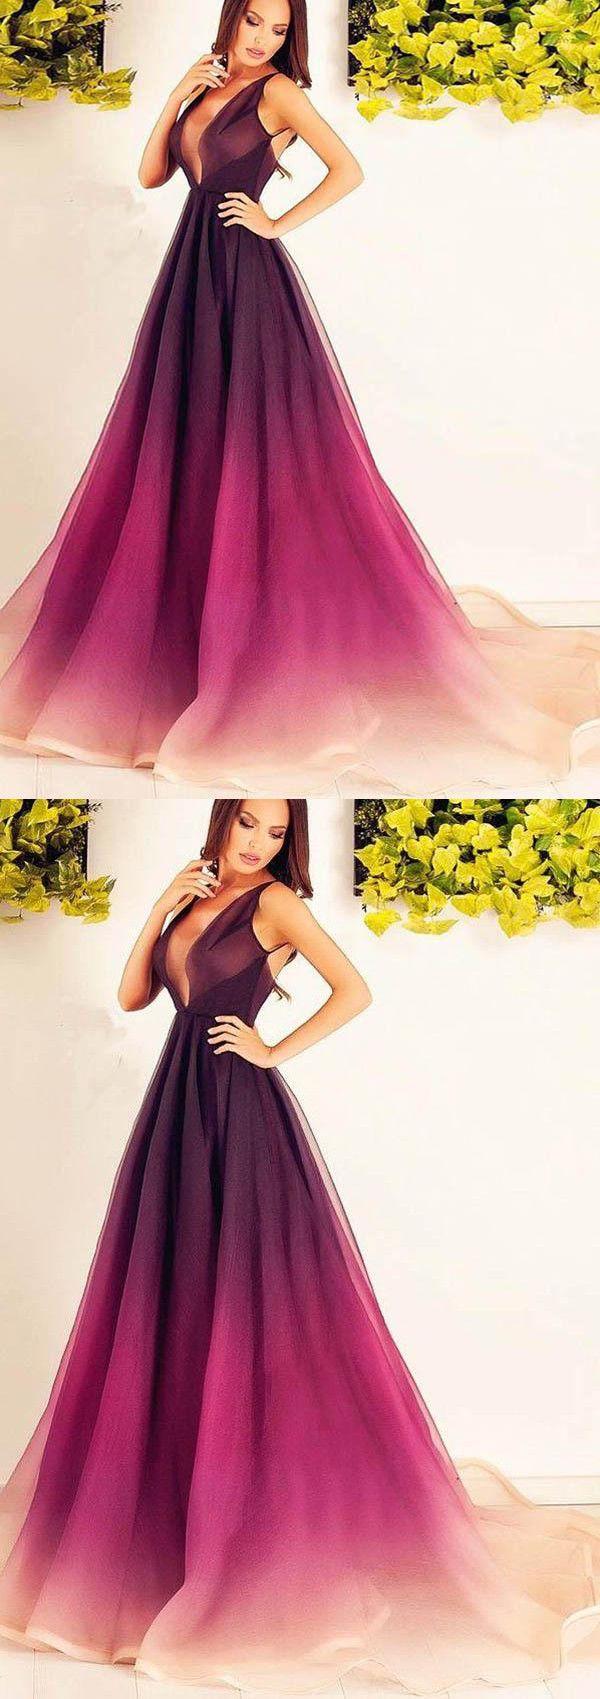 prom dresses long,prom dresses modest